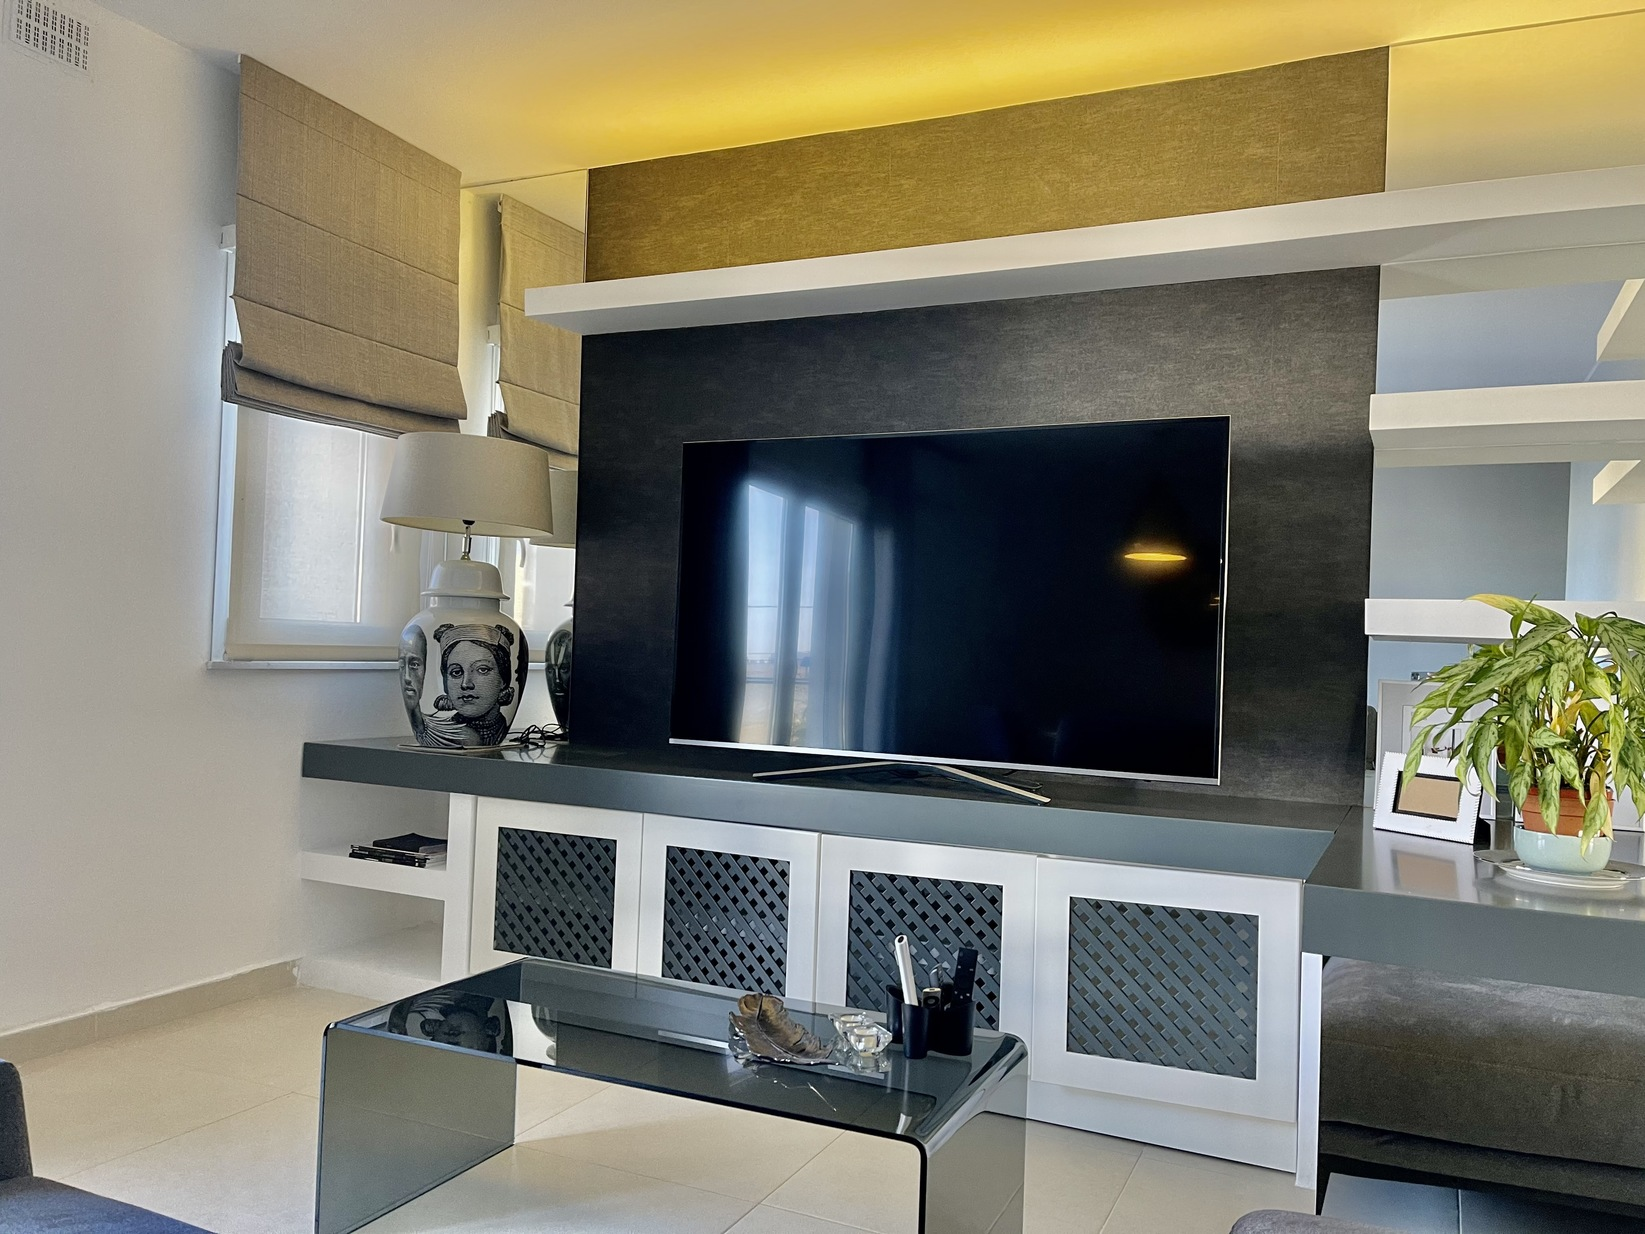 3 bed Apartment For Rent in Bahar Ic-Caghaq, Bahar ic-Caghaq - thumb 5